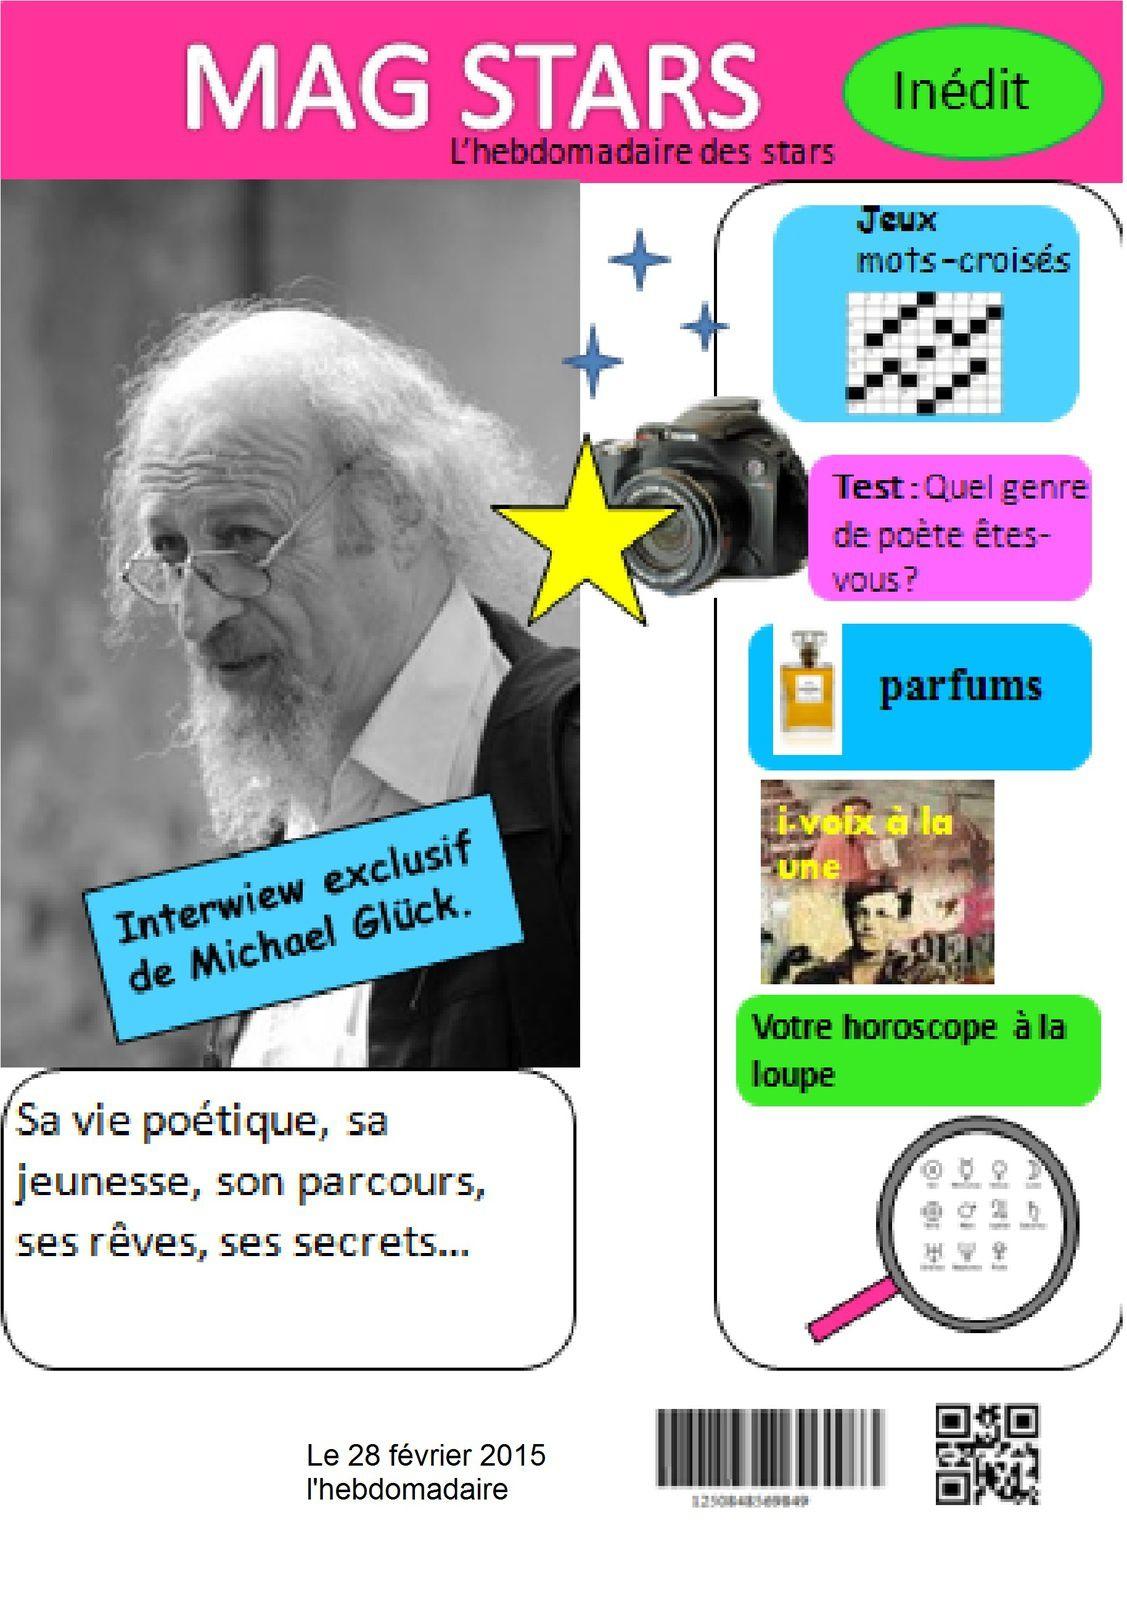 Interwiew imaginaire - Michaël Glück